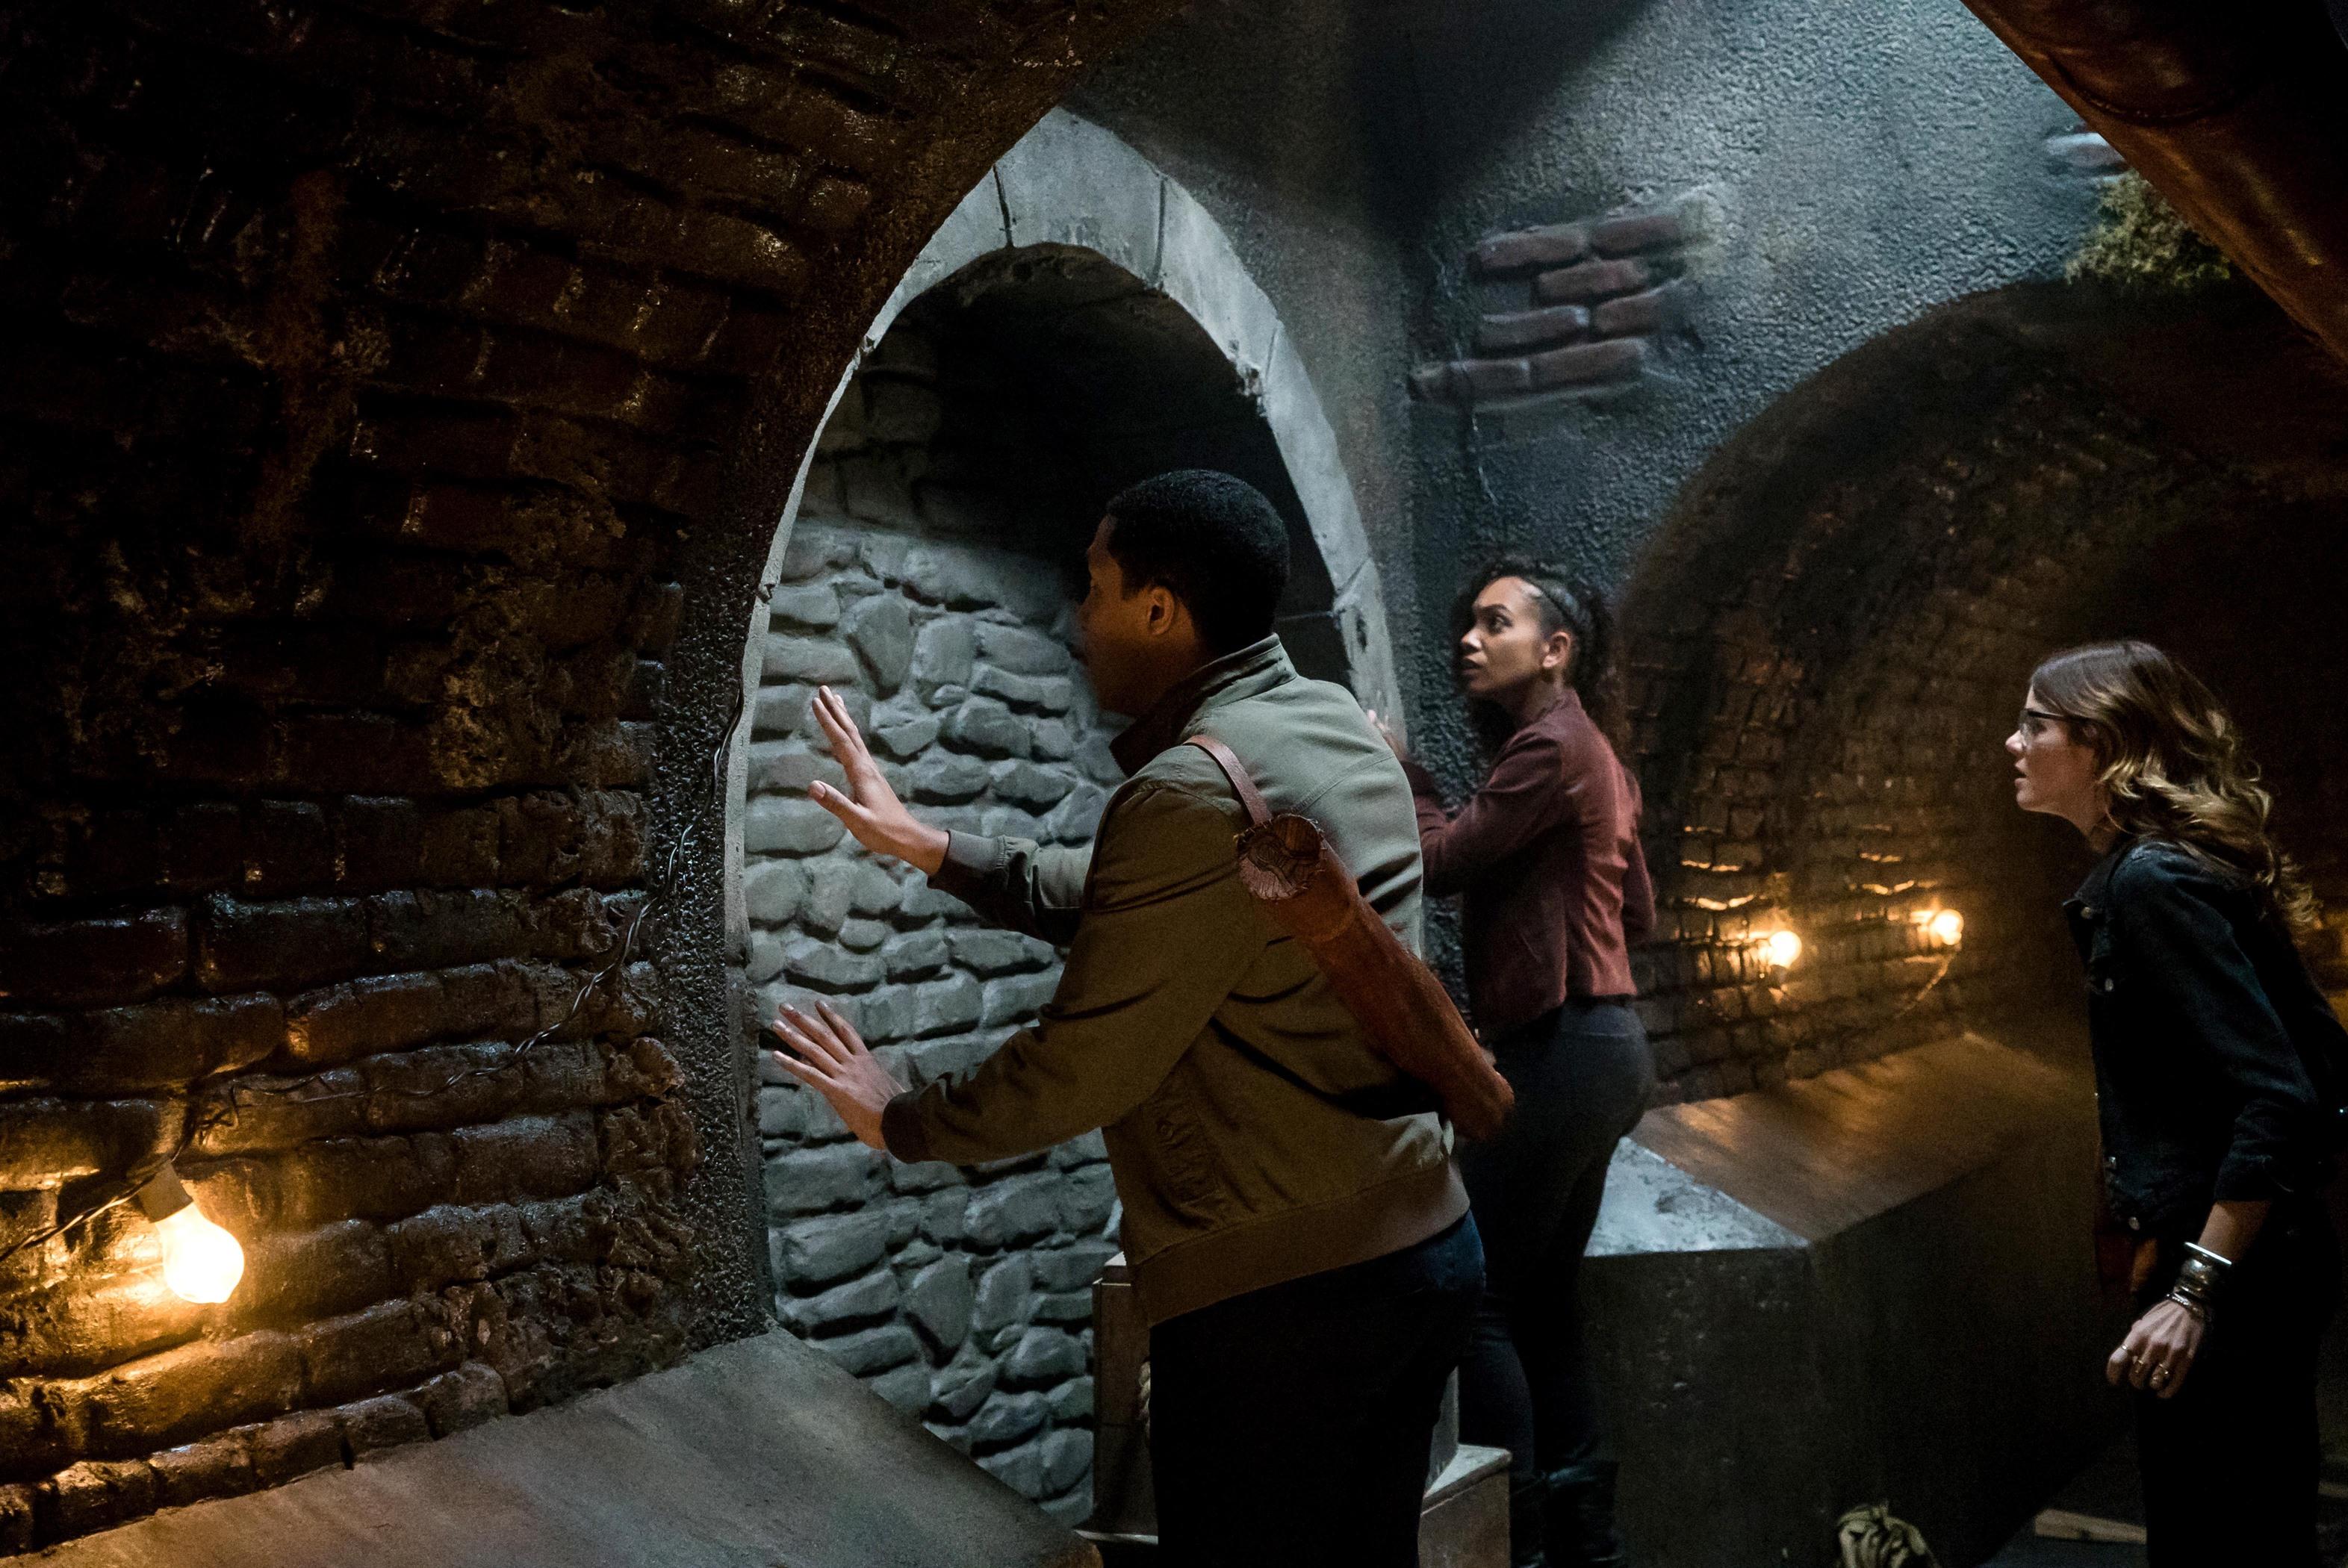 Rachel Melvin, Lyndie Greenwood, and Jerry MacKinnon in Sleepy Hollow (2013)